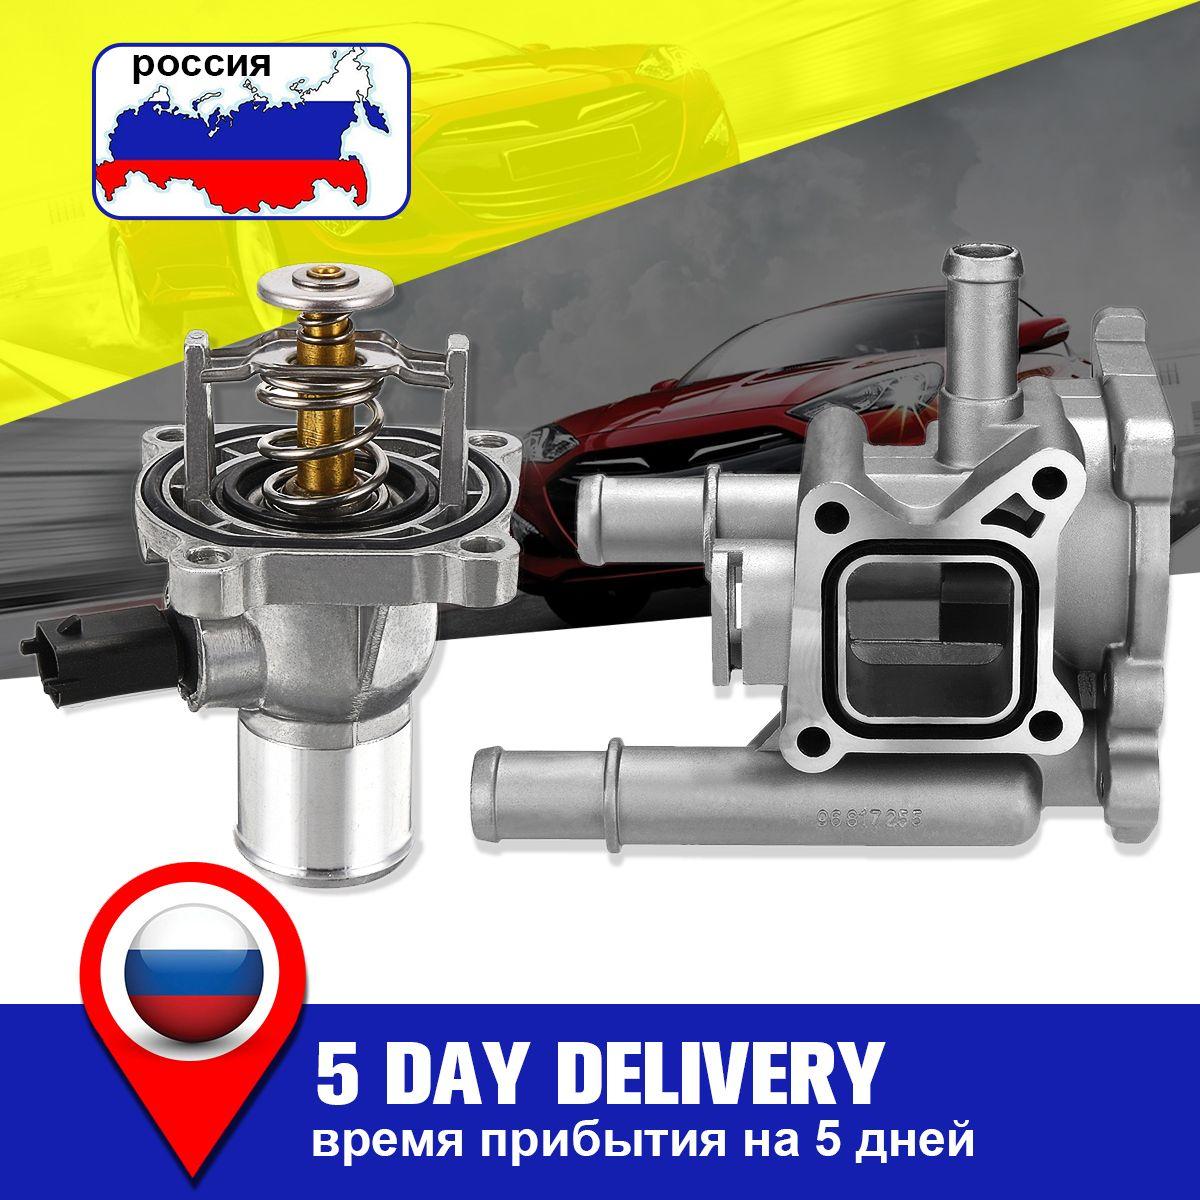 Aluminum Thermostat Housing Cover For Chevrolet Chevy Cruze Aveo Orlando For Opel Astra Zafira Signum 96984103 96984104 96817255